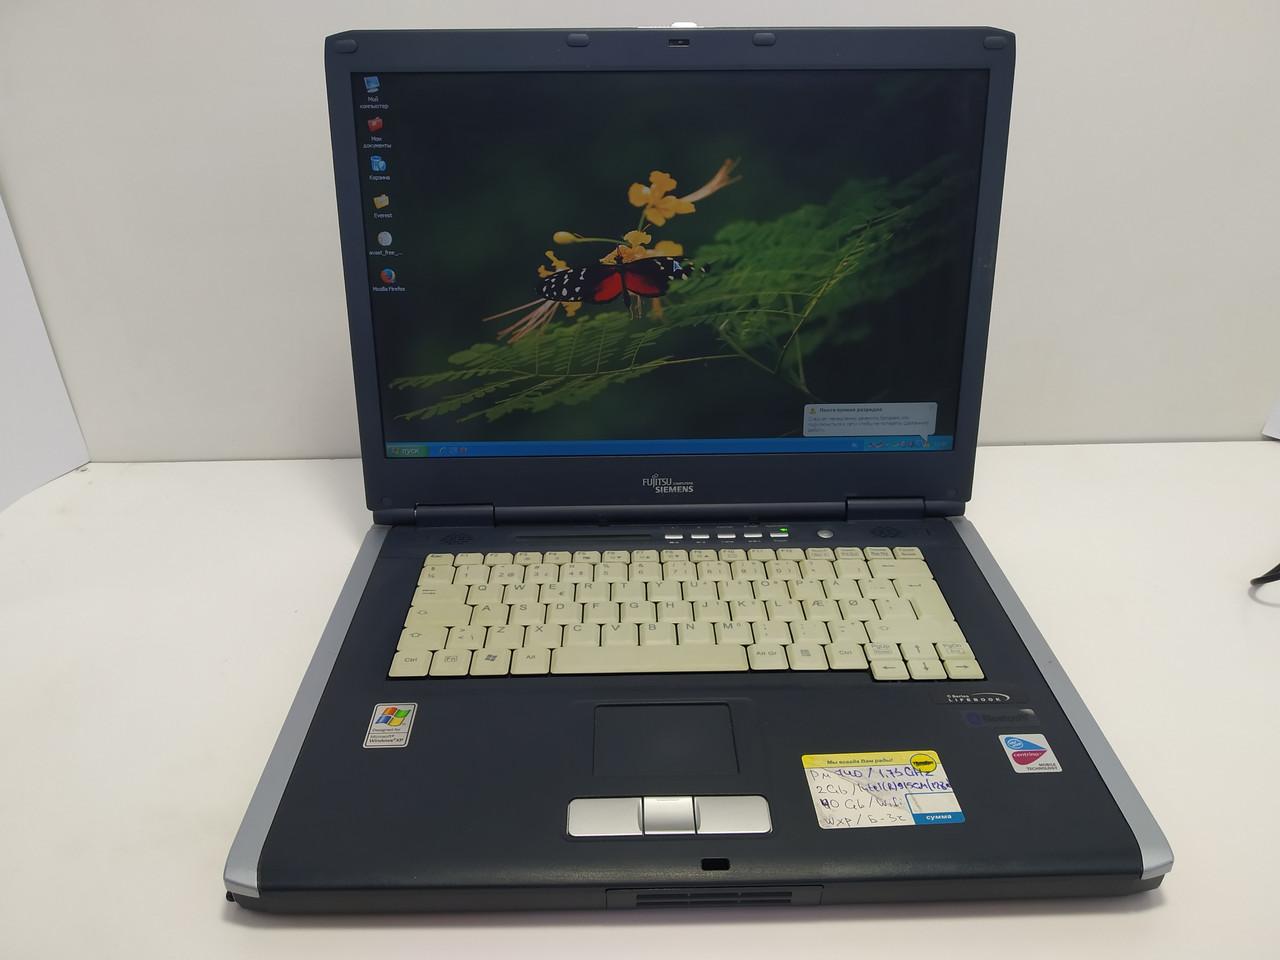 FujitsuSiemensLifebook C1320 \ 2 ГБ ОЗУ \ батарея 3 часа